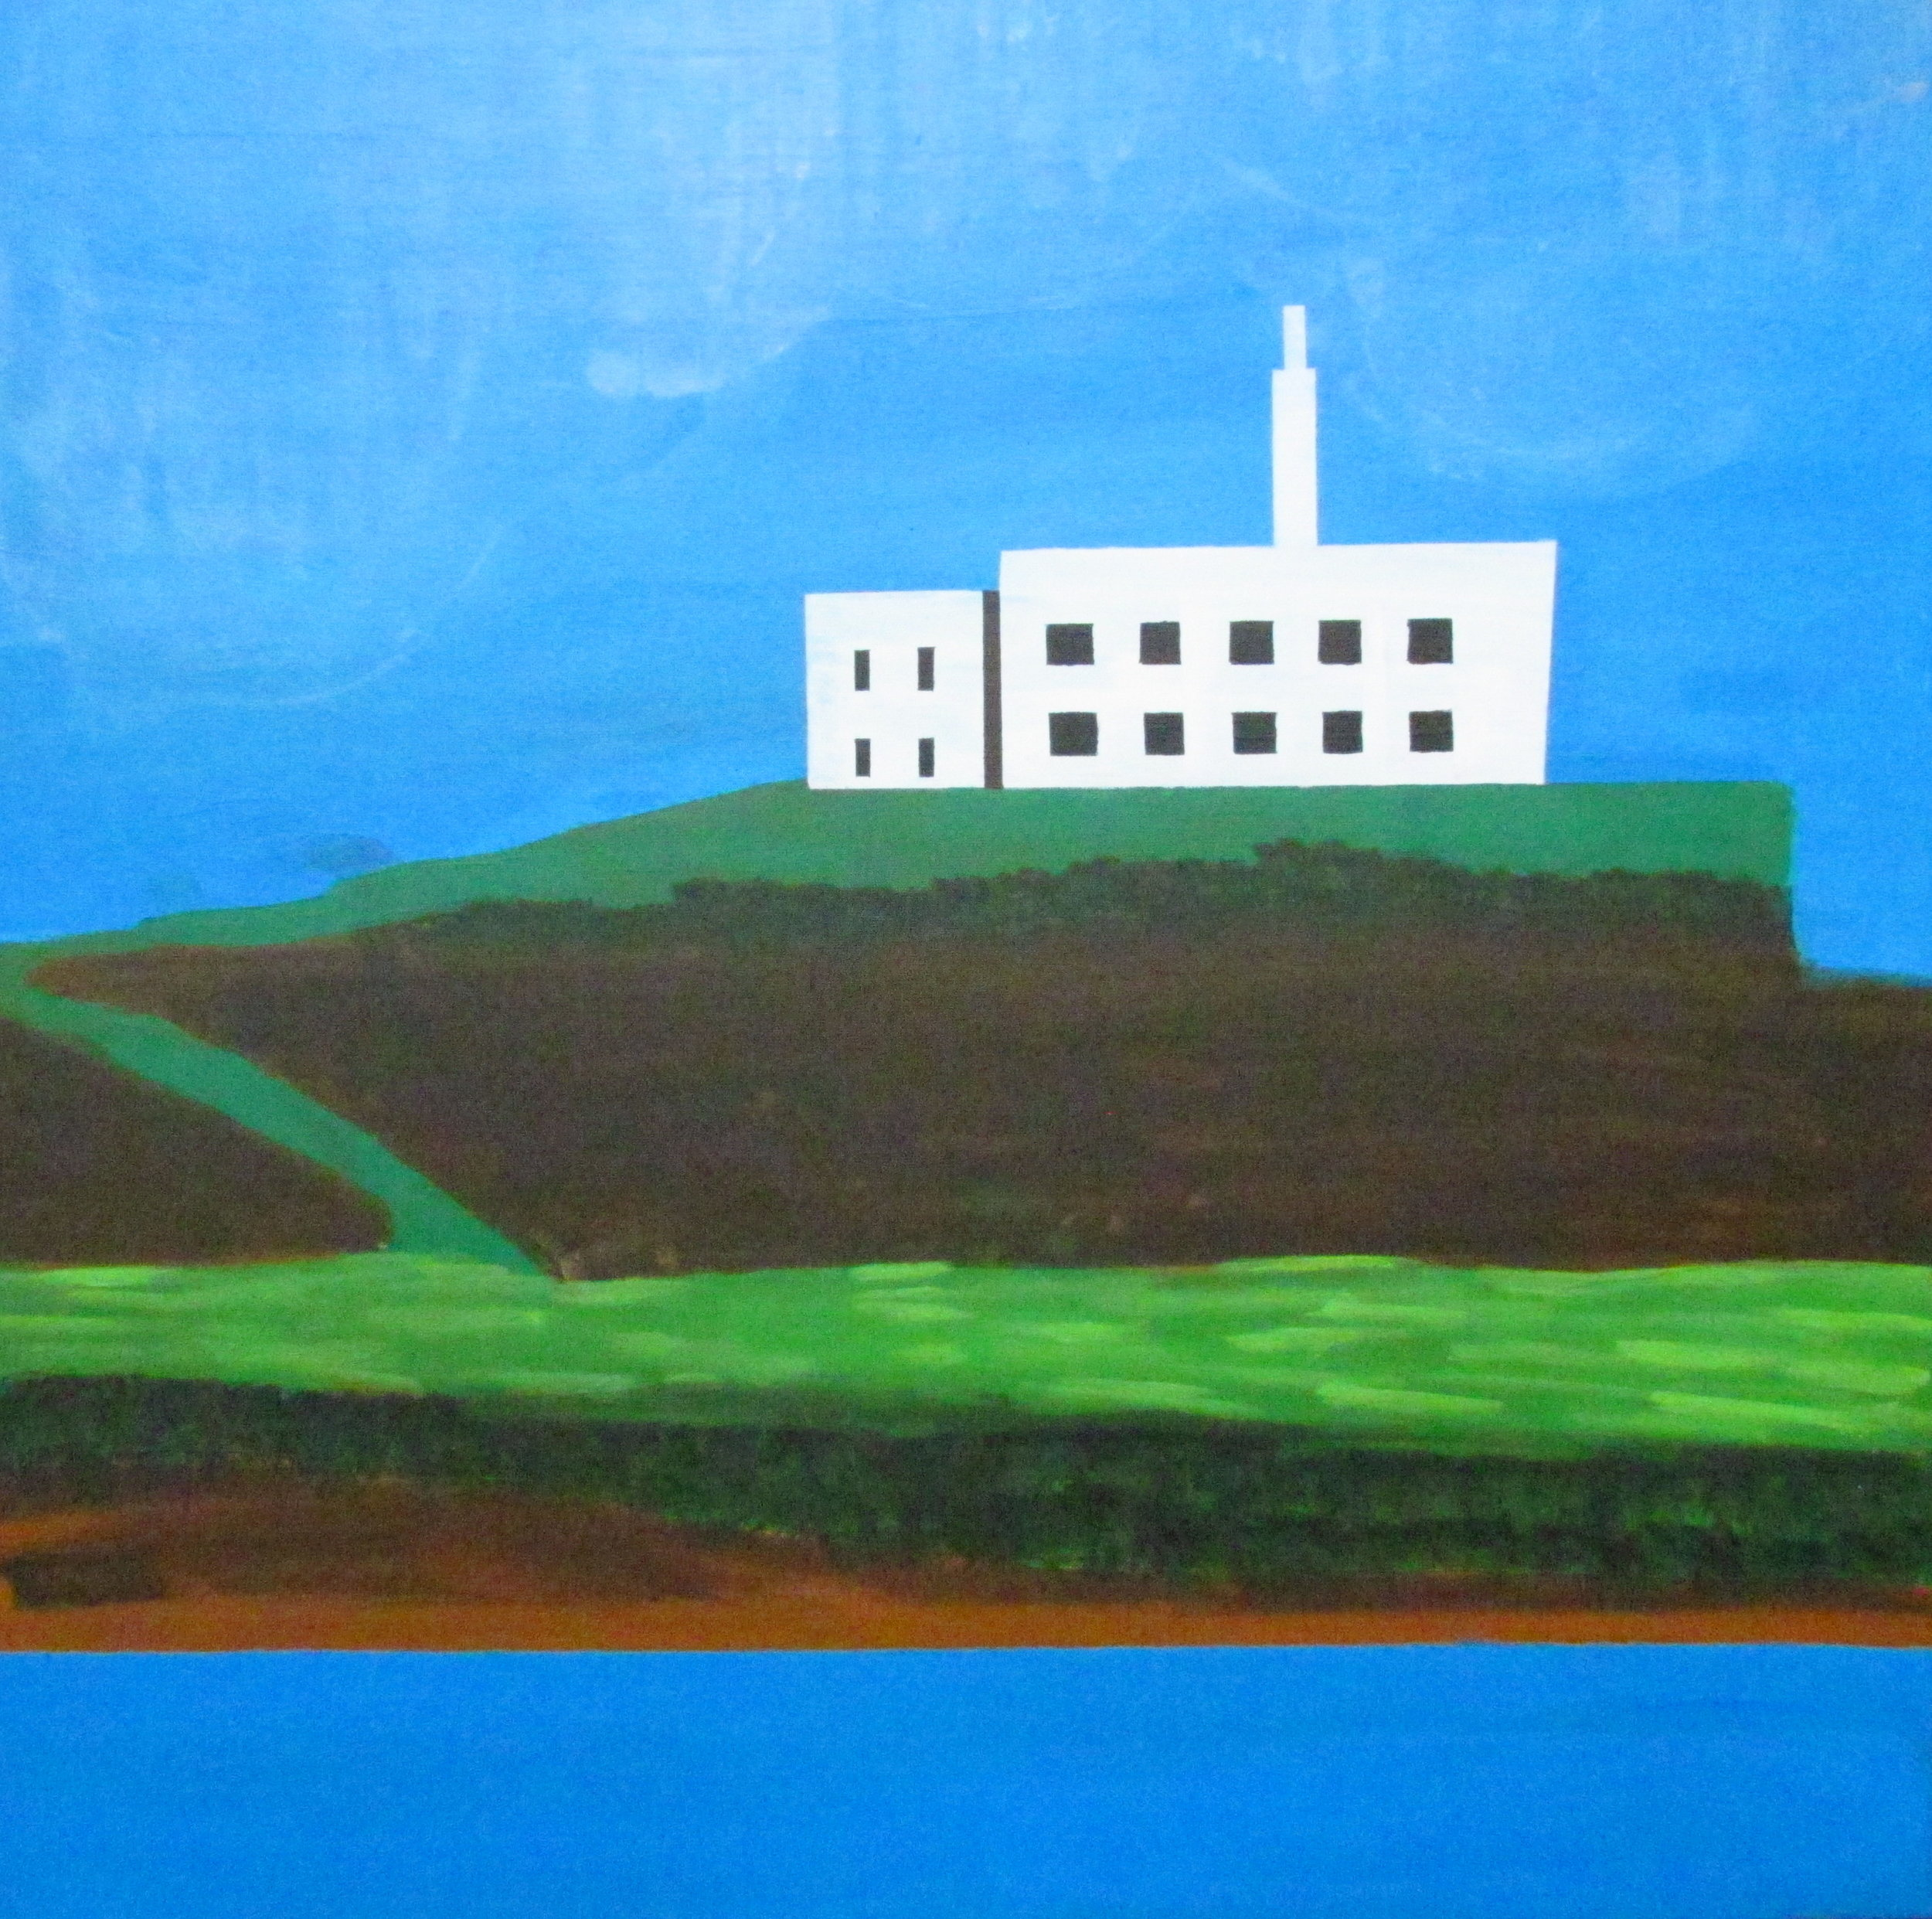 18 2016 View to Jail, Acrylic on canvas, Yaniv Janson 76X76cm.JPG.JPG